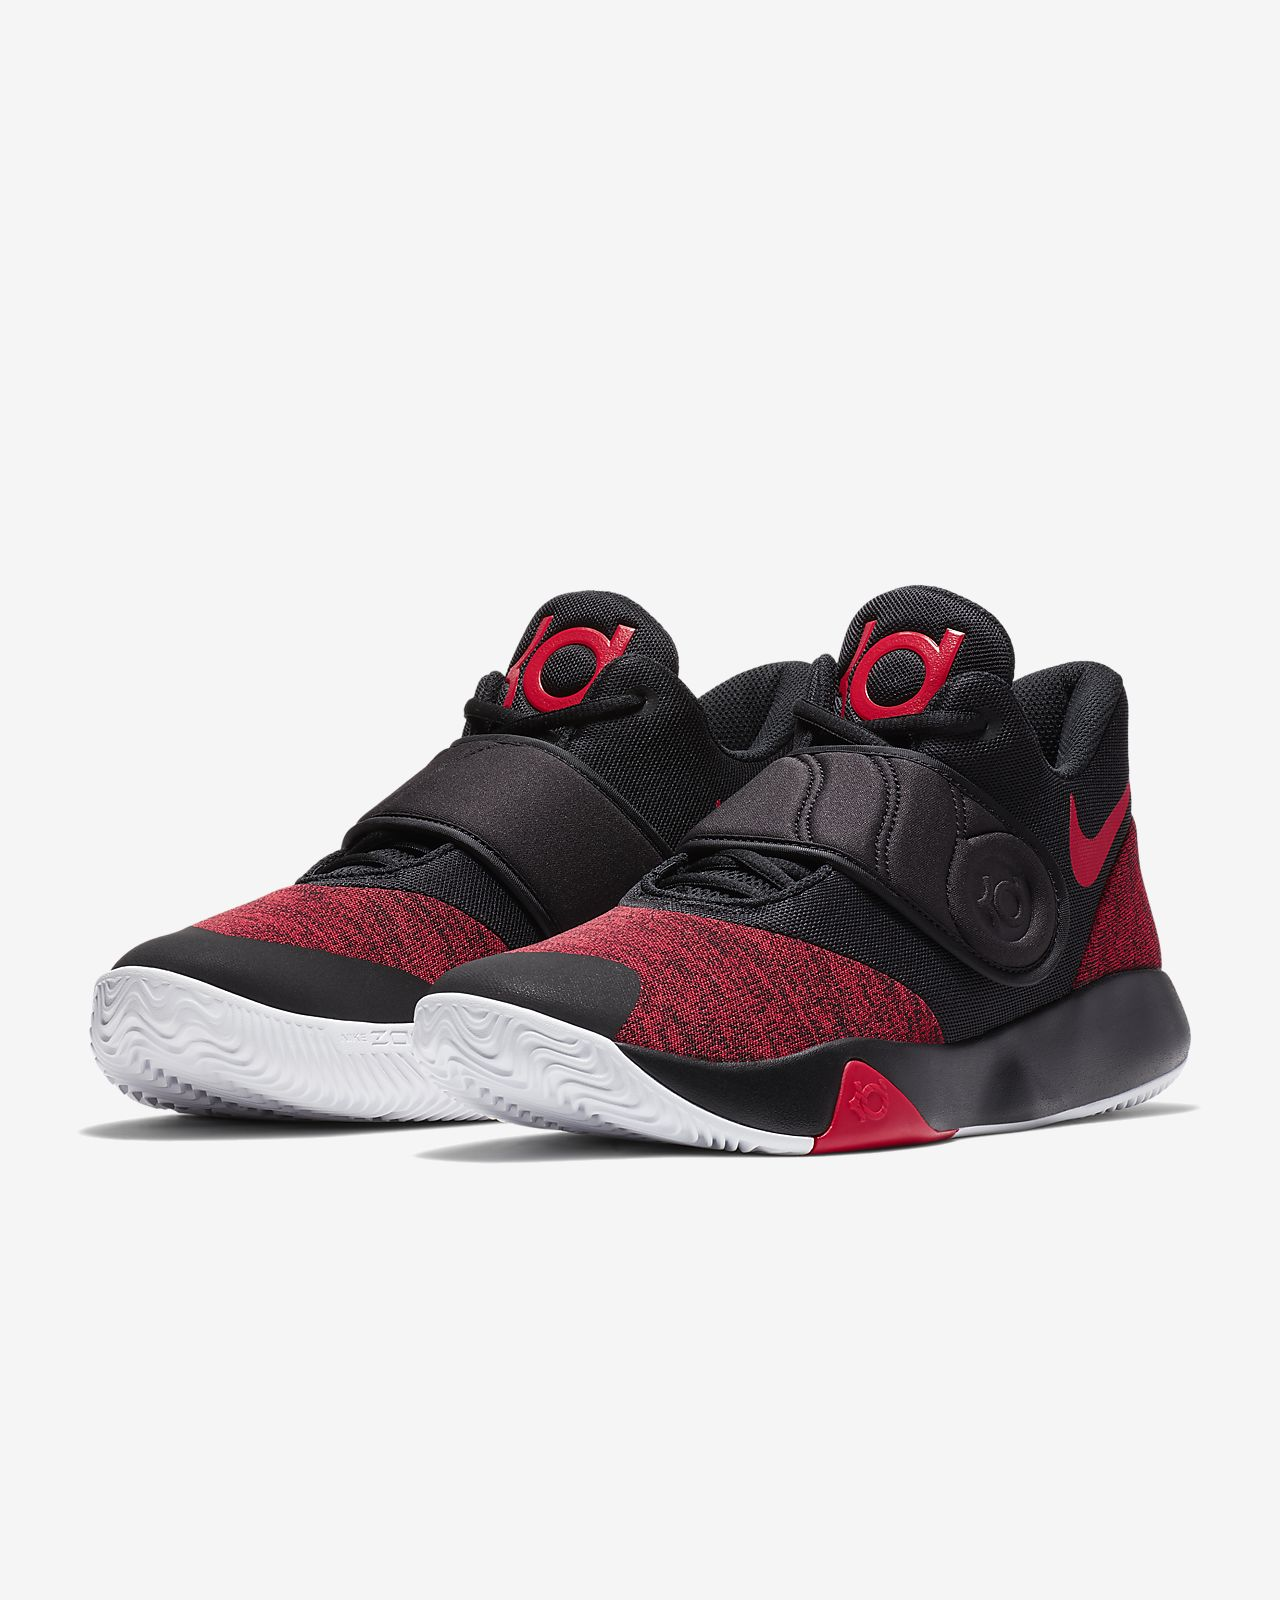 a5fc0575d9ef8a Nike KD Trey 5 VI Basketball Shoe. Nike.com IN